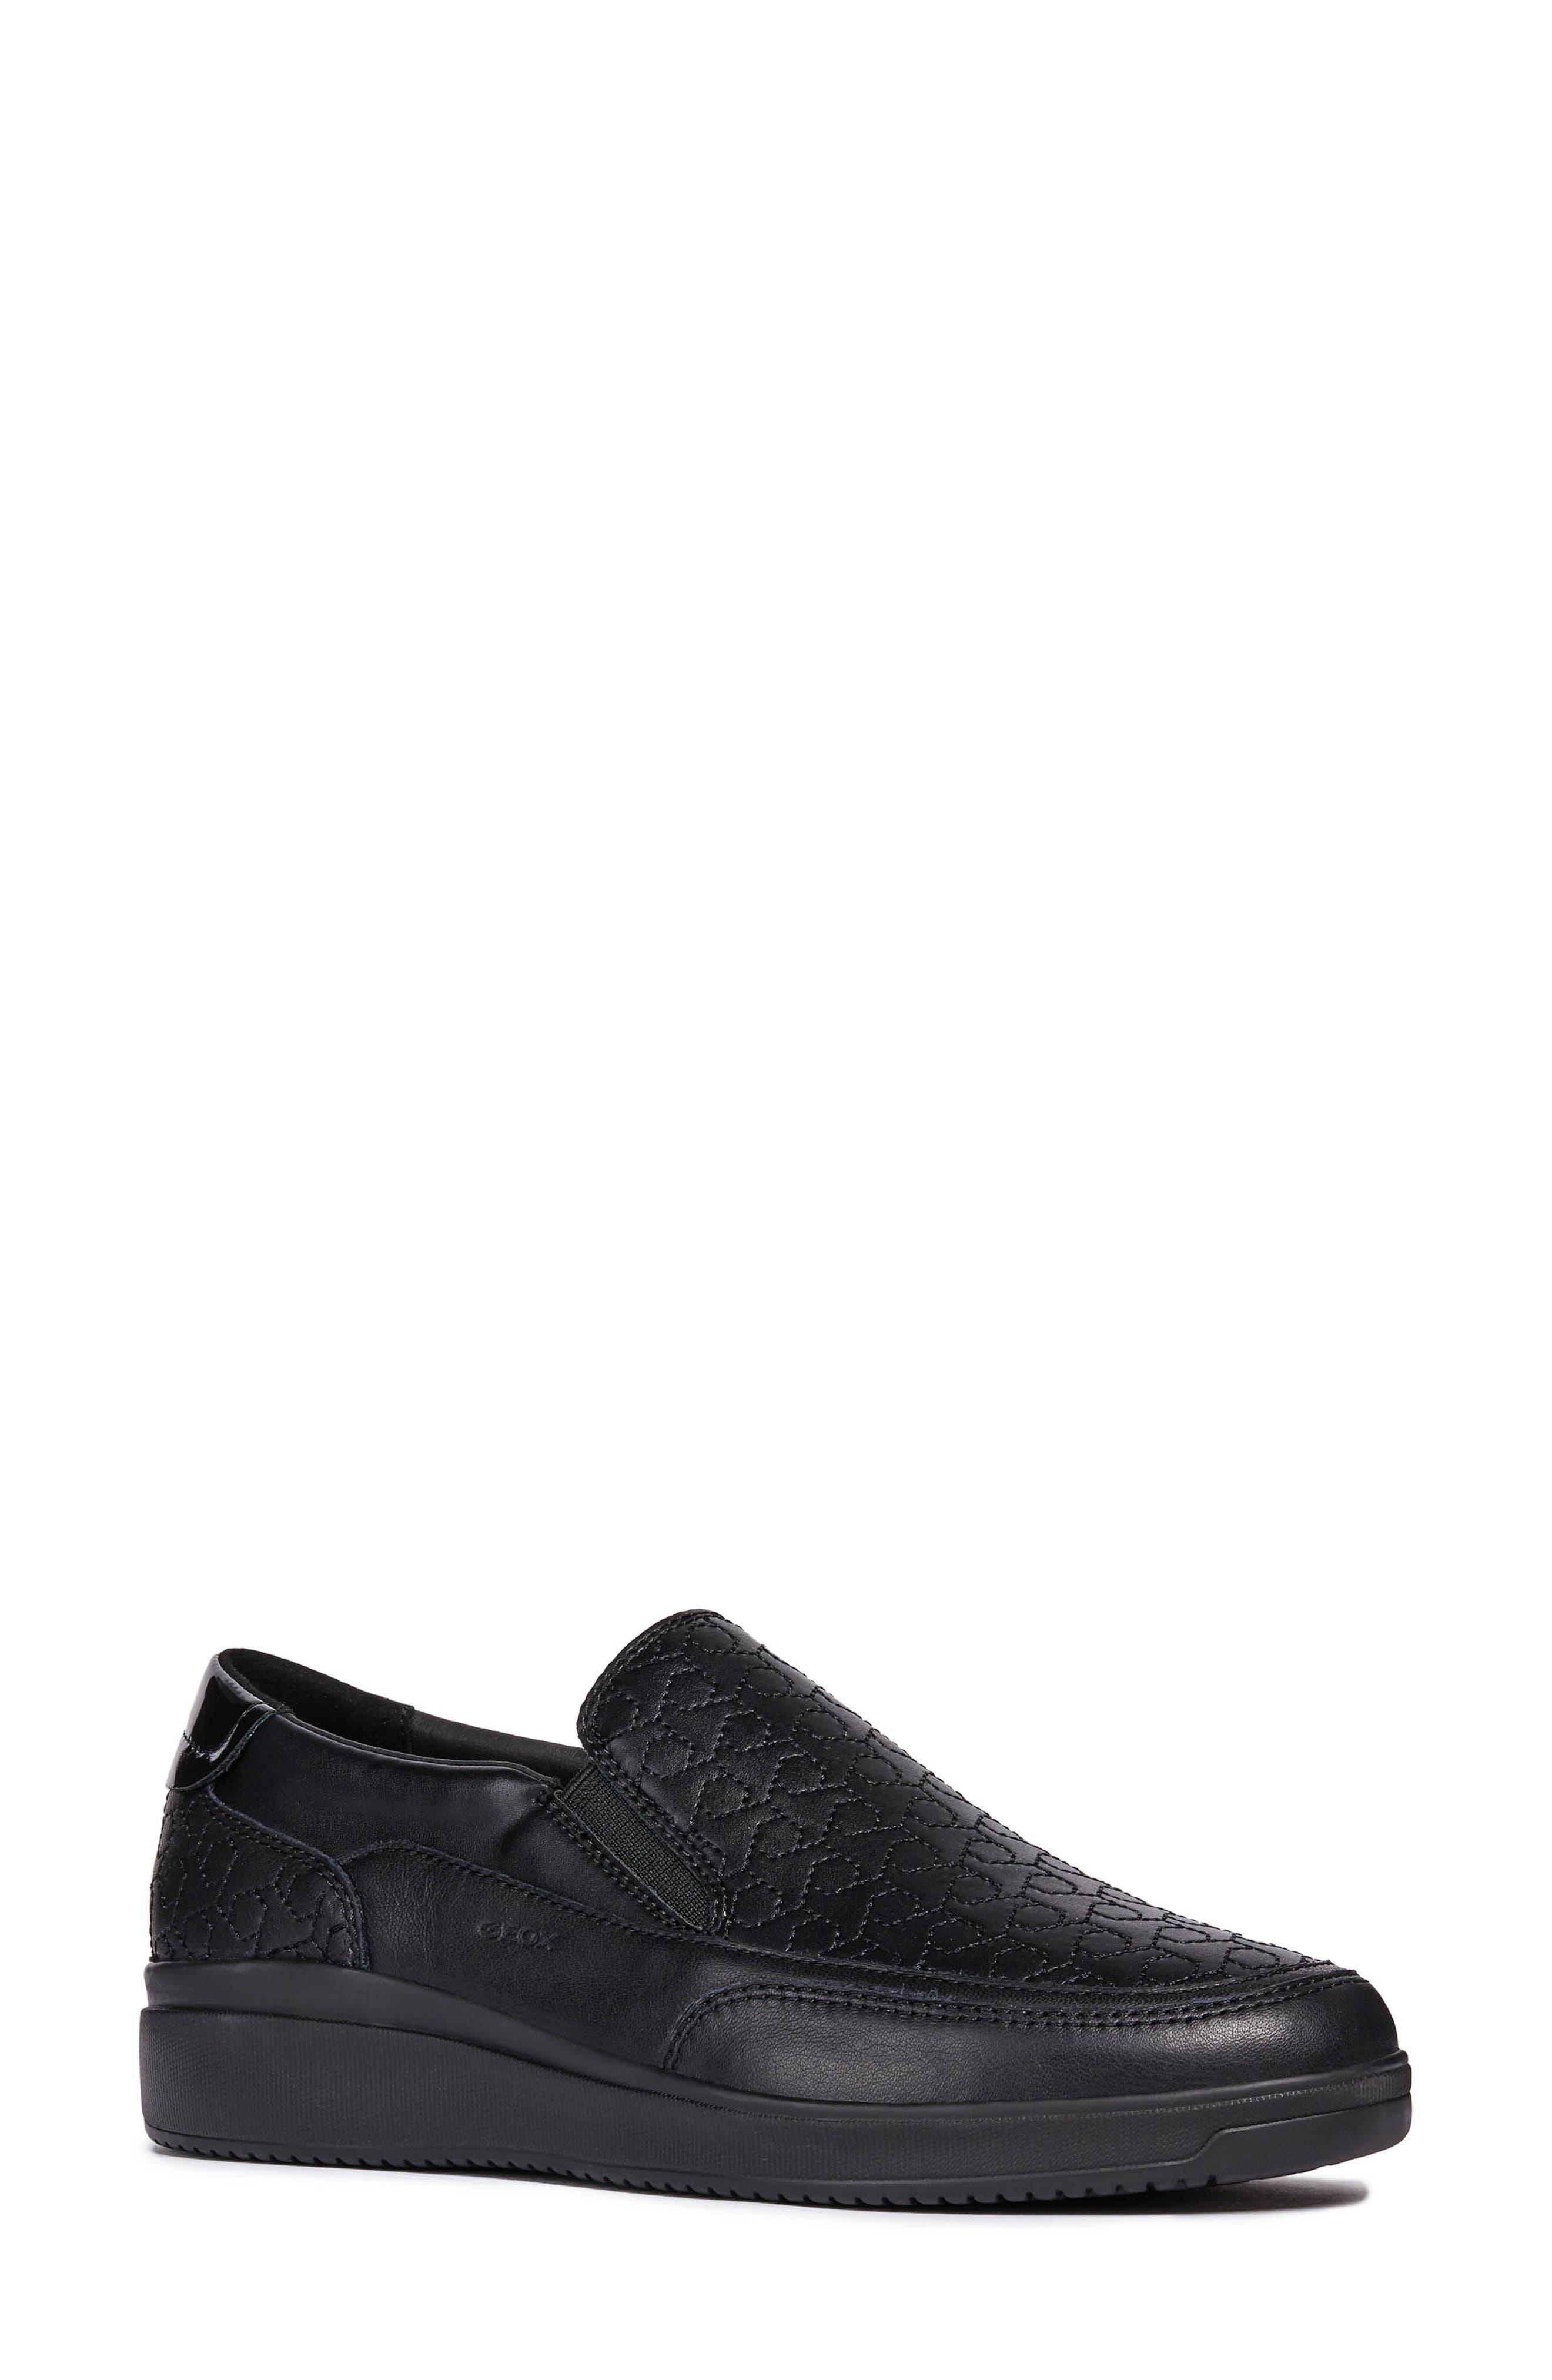 Tahina Slip-On Sneaker,                             Main thumbnail 1, color,                             BLACK FABRIC